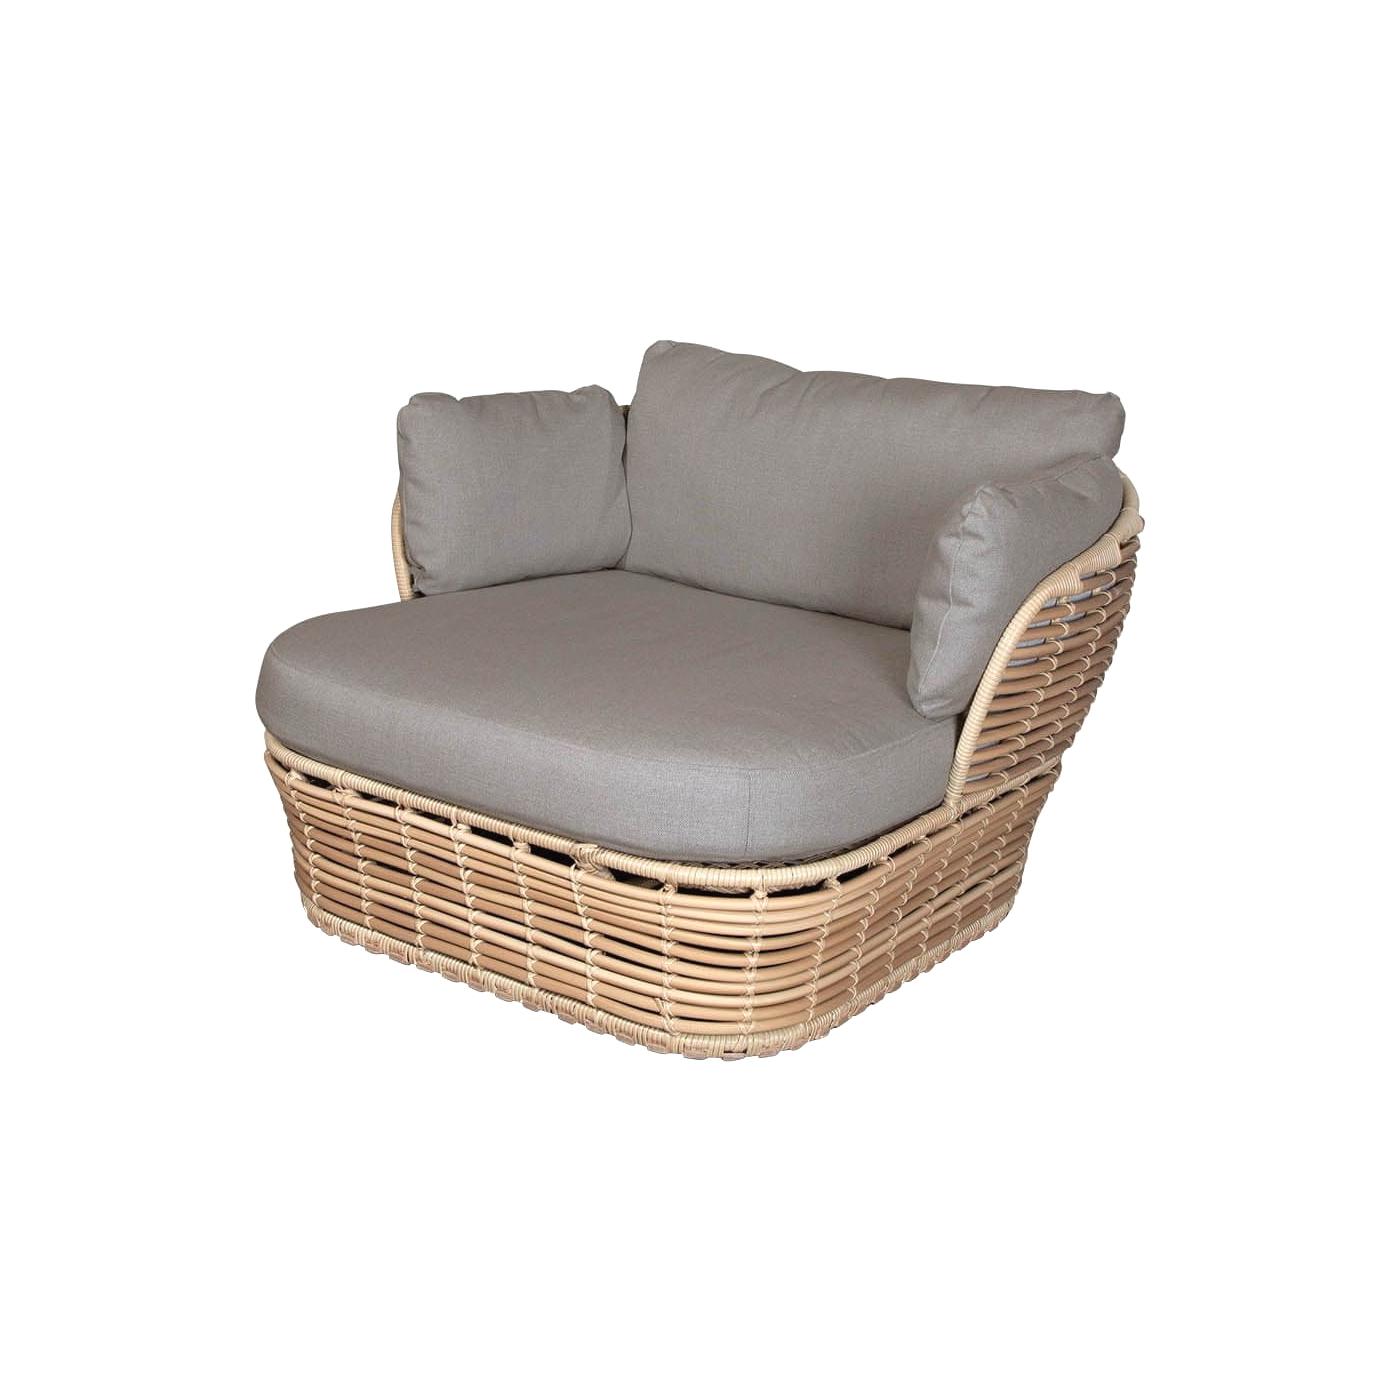 Basket Lounge fåtölj AirTouch dynset Cane-line